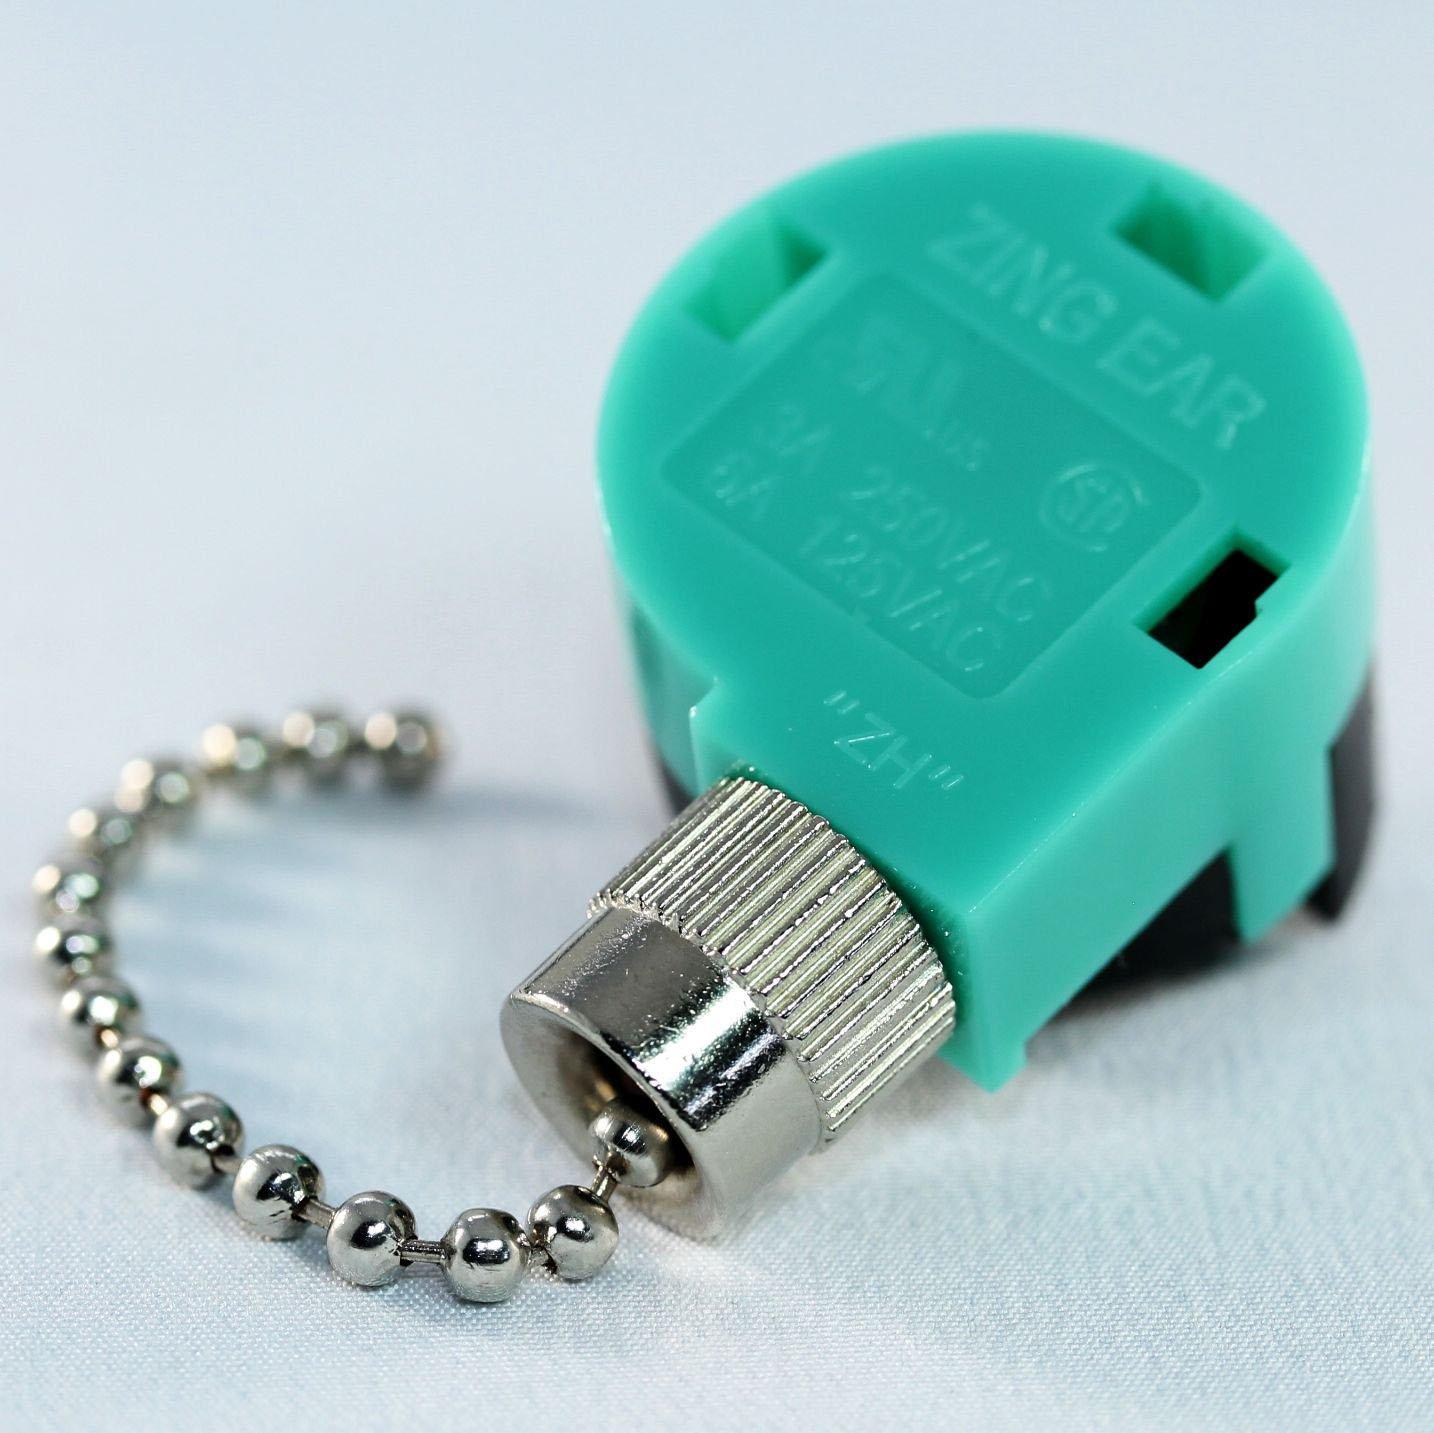 Zing Ear Fan Switch Wiring - Auto Electrical Wiring Diagram •